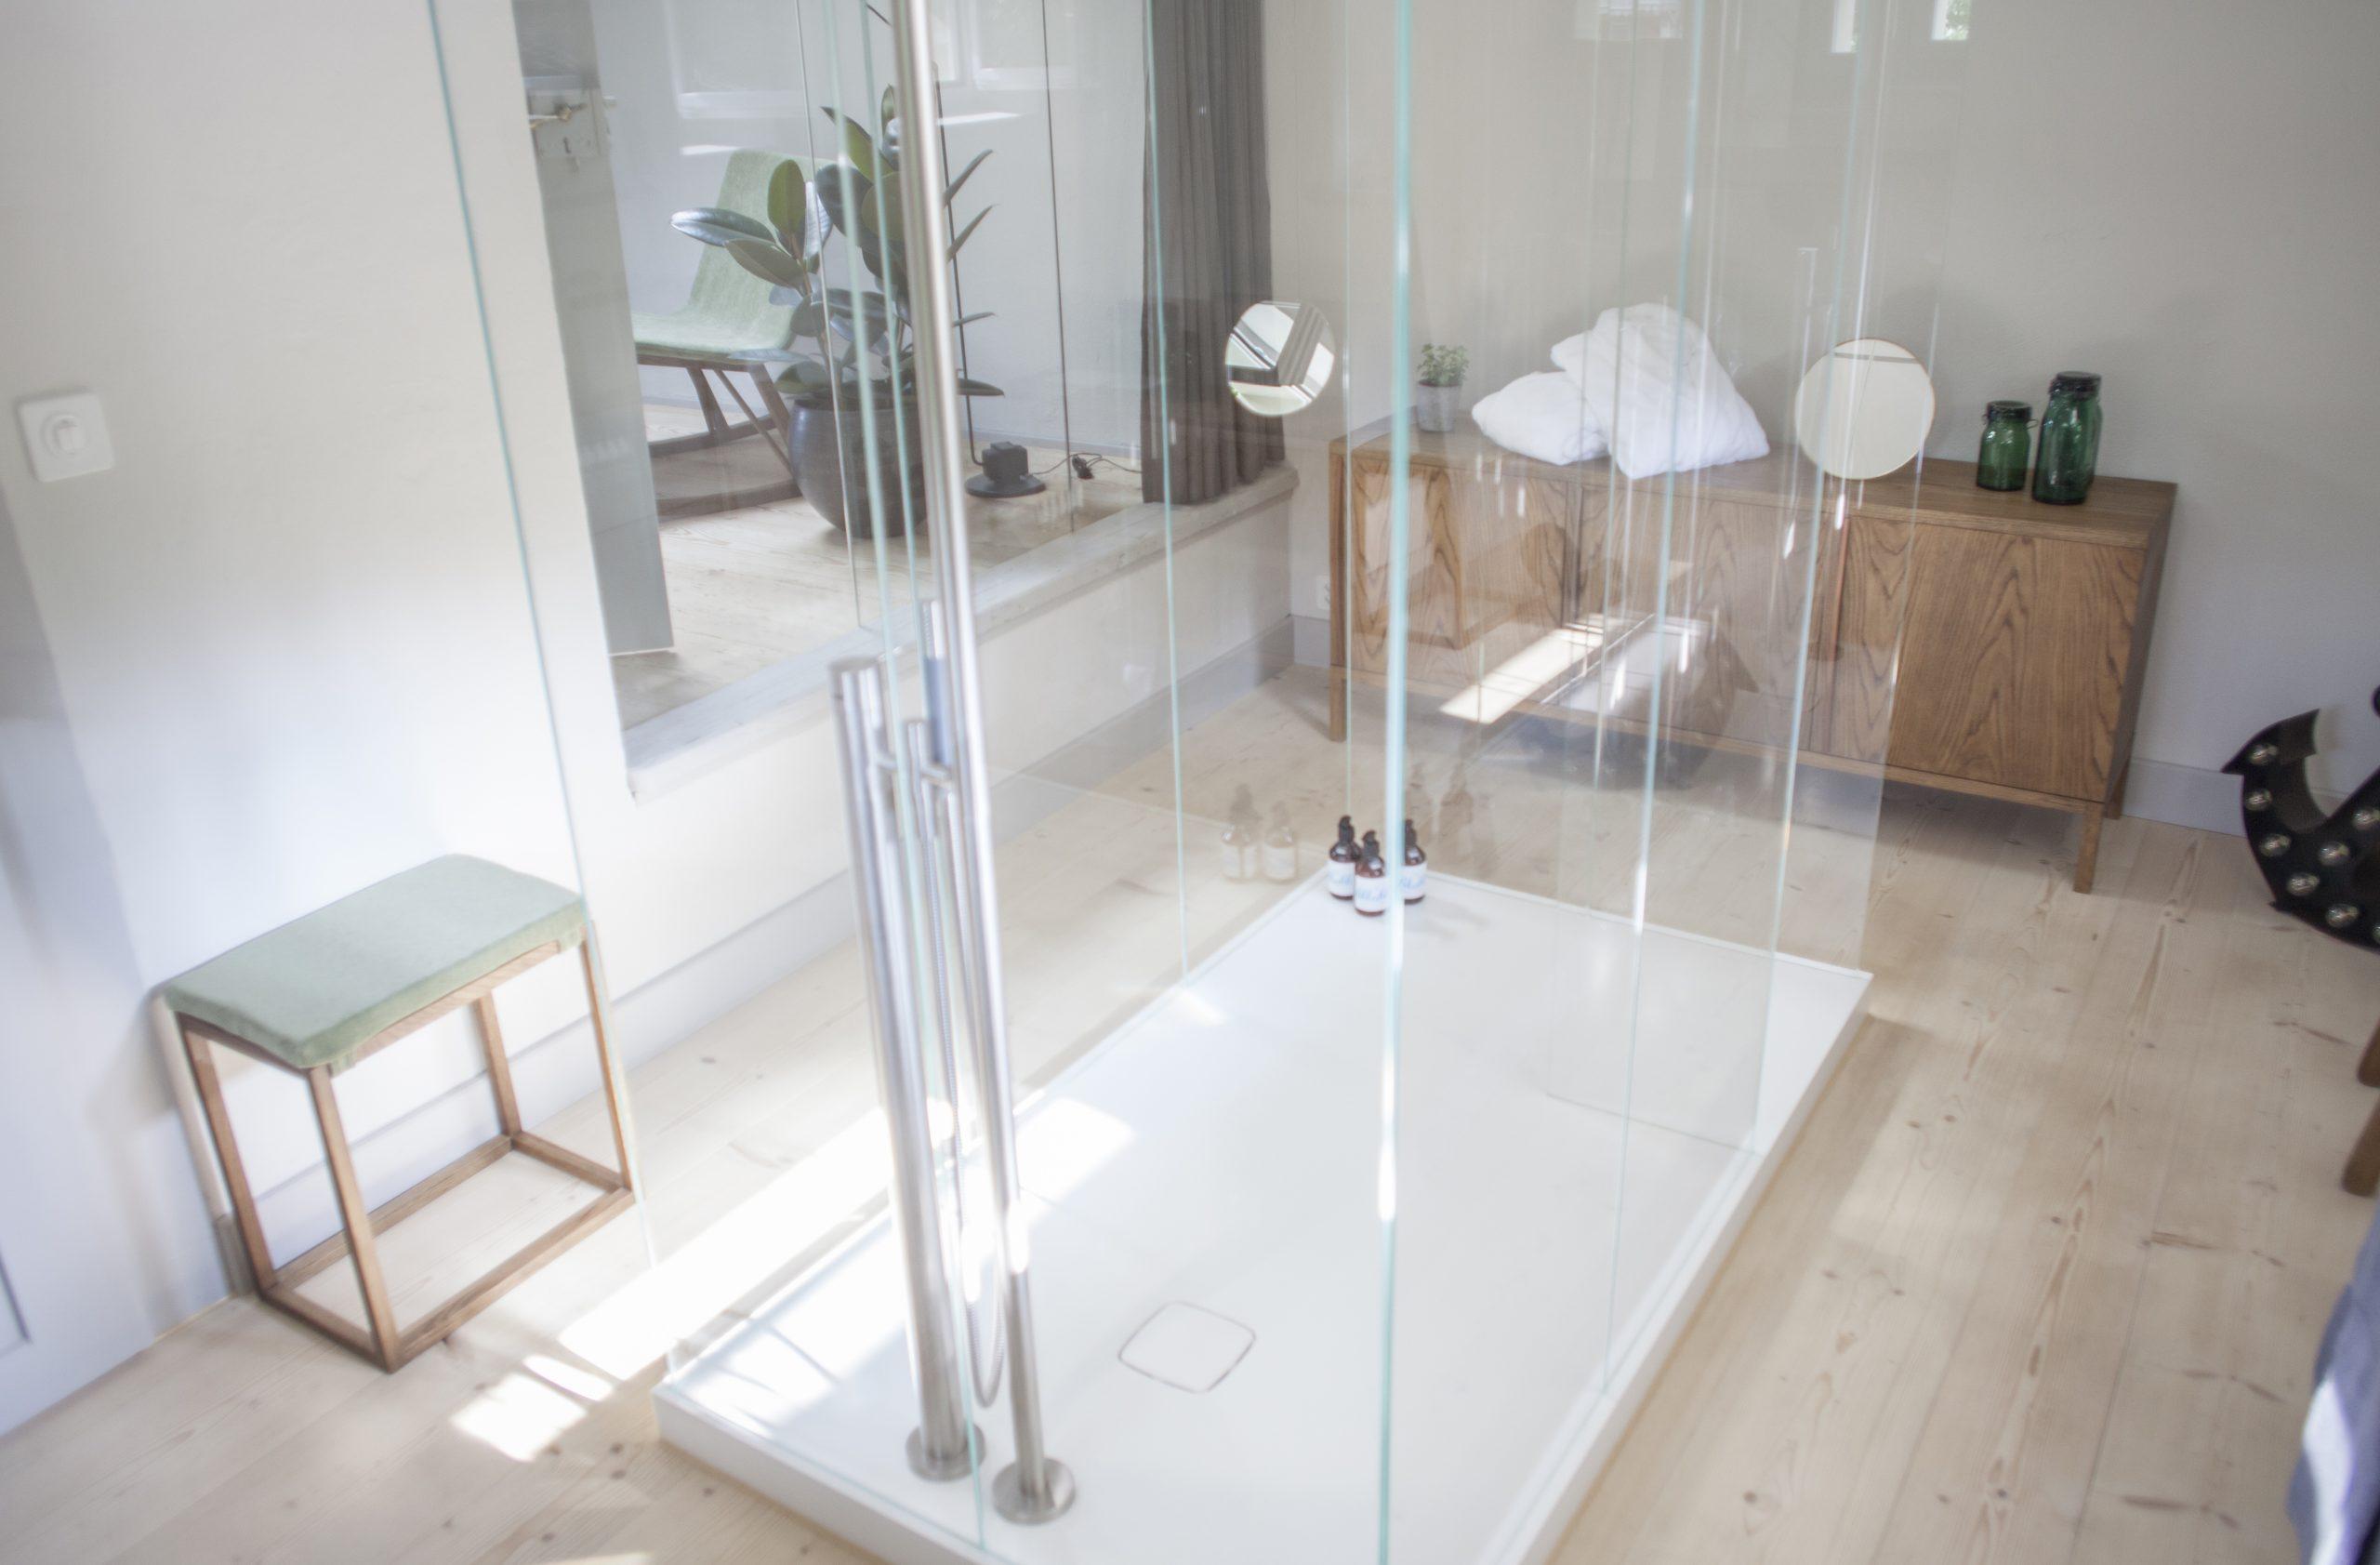 Zollhaus Bath copia